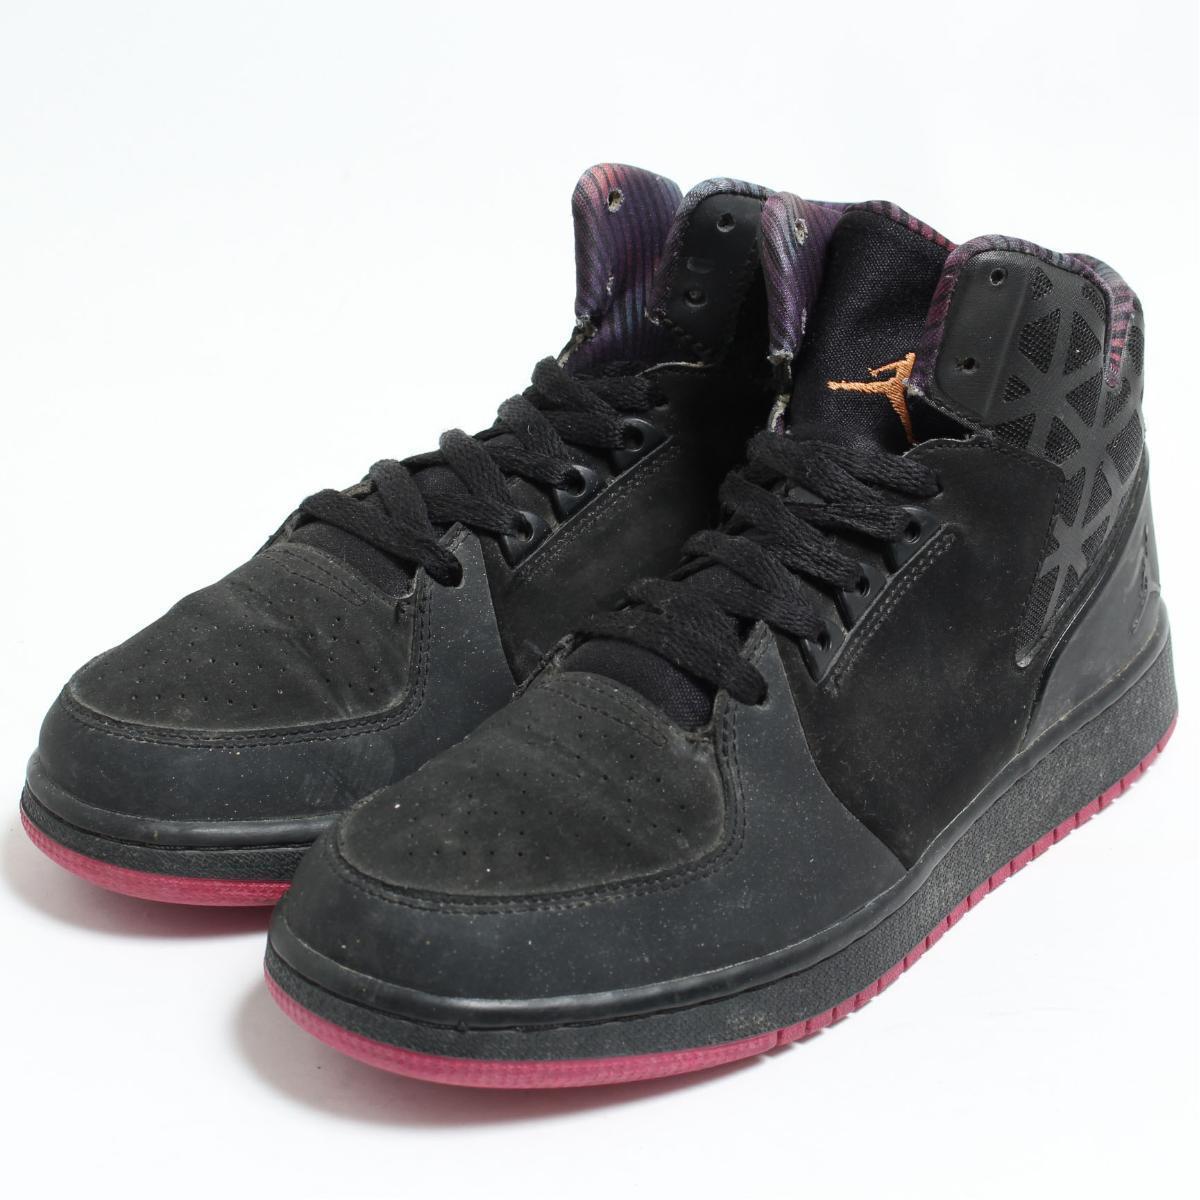 big sale 17726 48bbe Nike NIKE AIR JORDAN 1 FLIGHT sneakers US7Y Lady's 25.0cm /bon9604